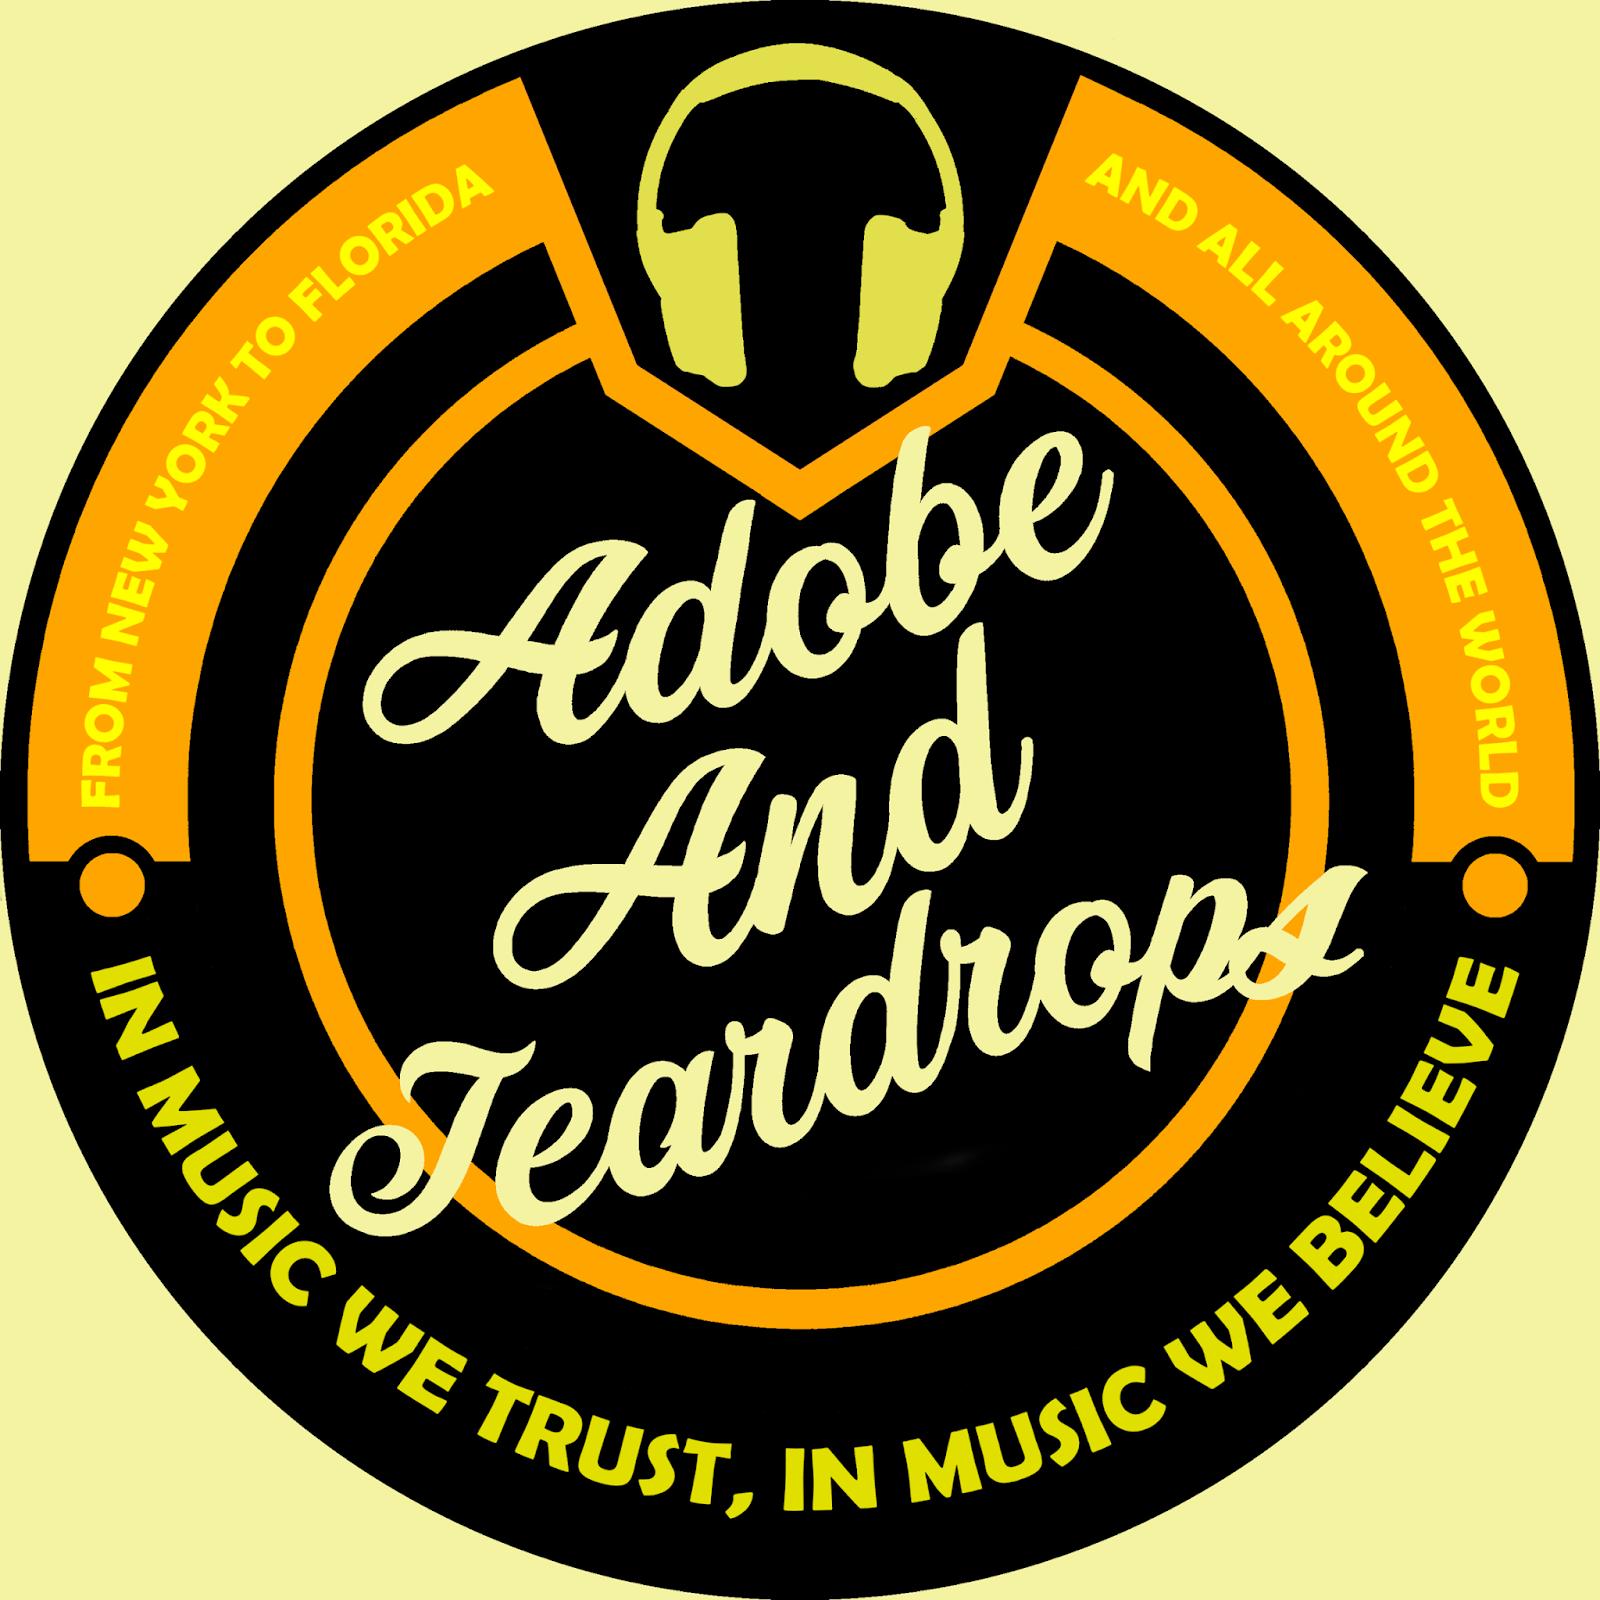 Adobe_and_Teardrops_2-medium.png